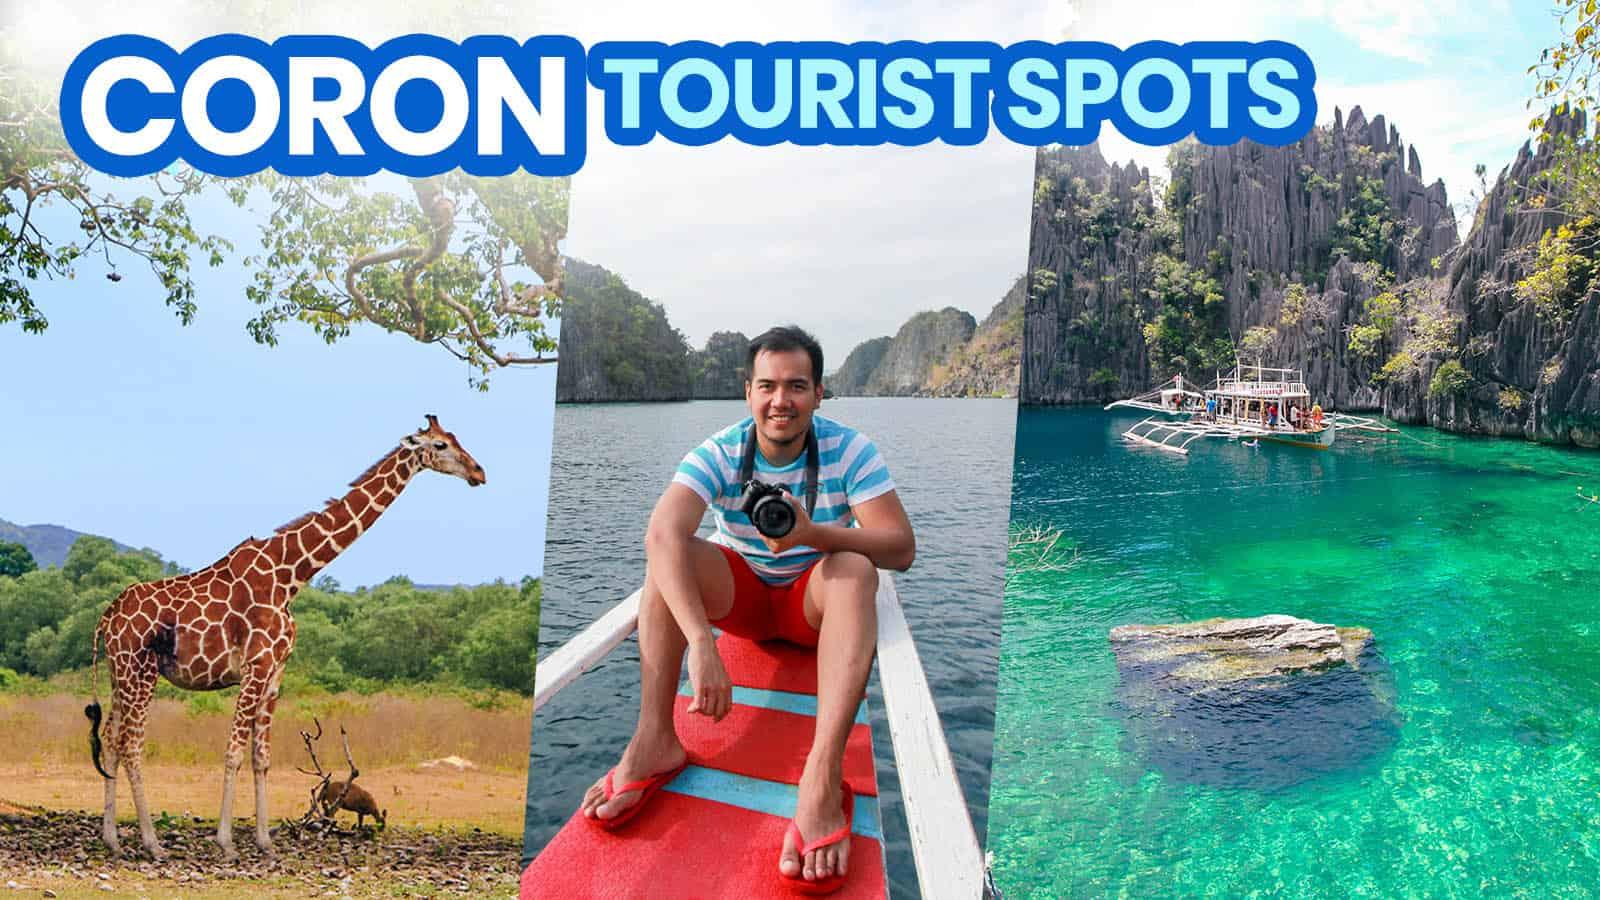 20 Best CORON PALAWAN TOURIST SPOTS & Things to Do